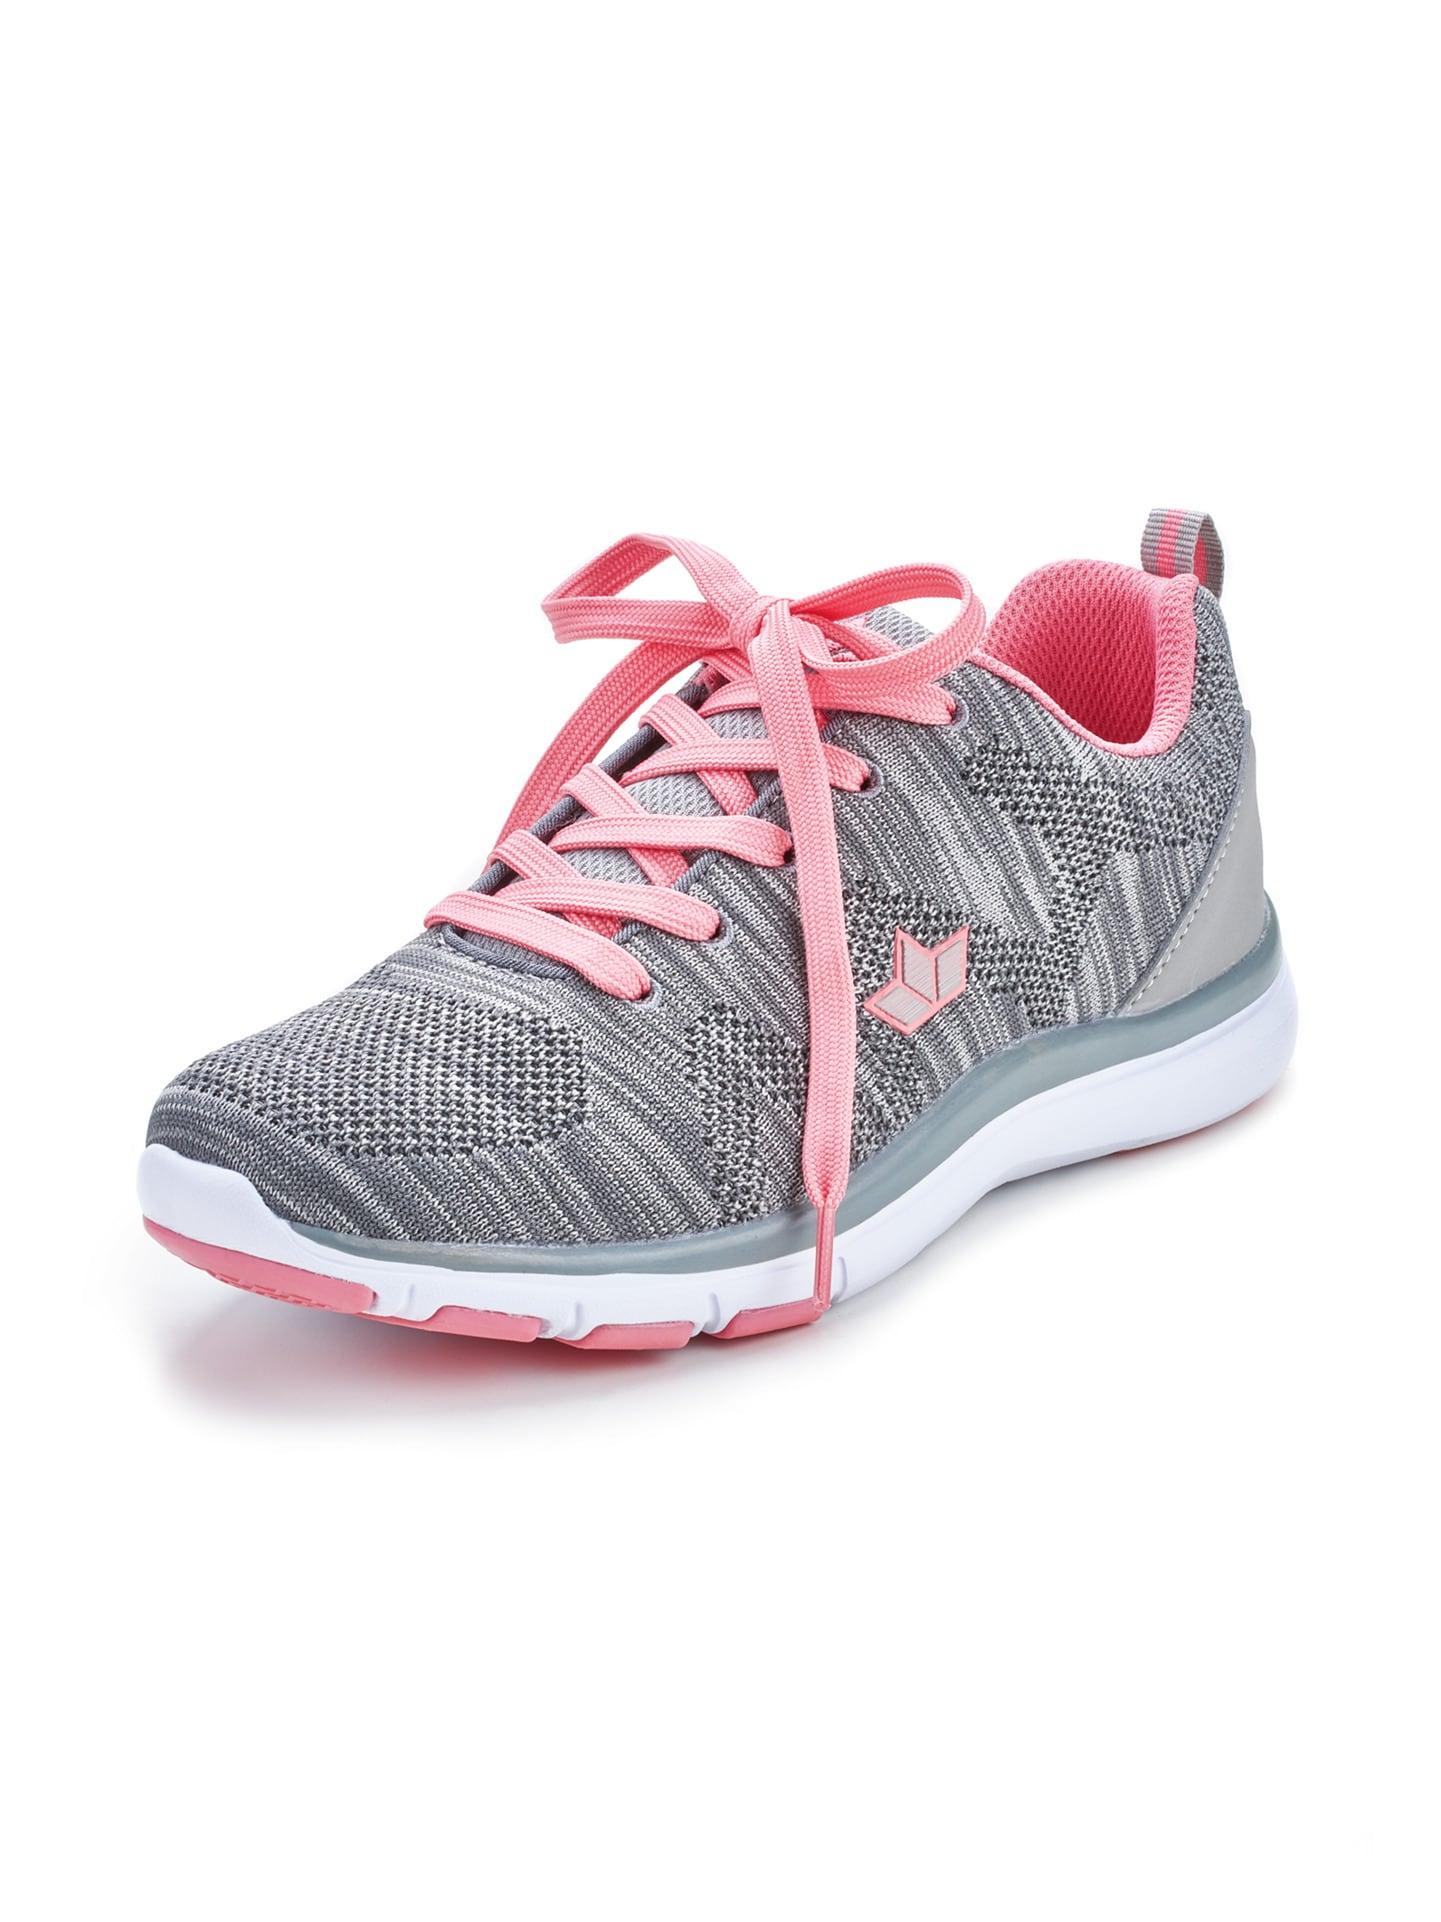 Avena Damen Ultra-Leicht-Sneaker Grau 45-7243-7